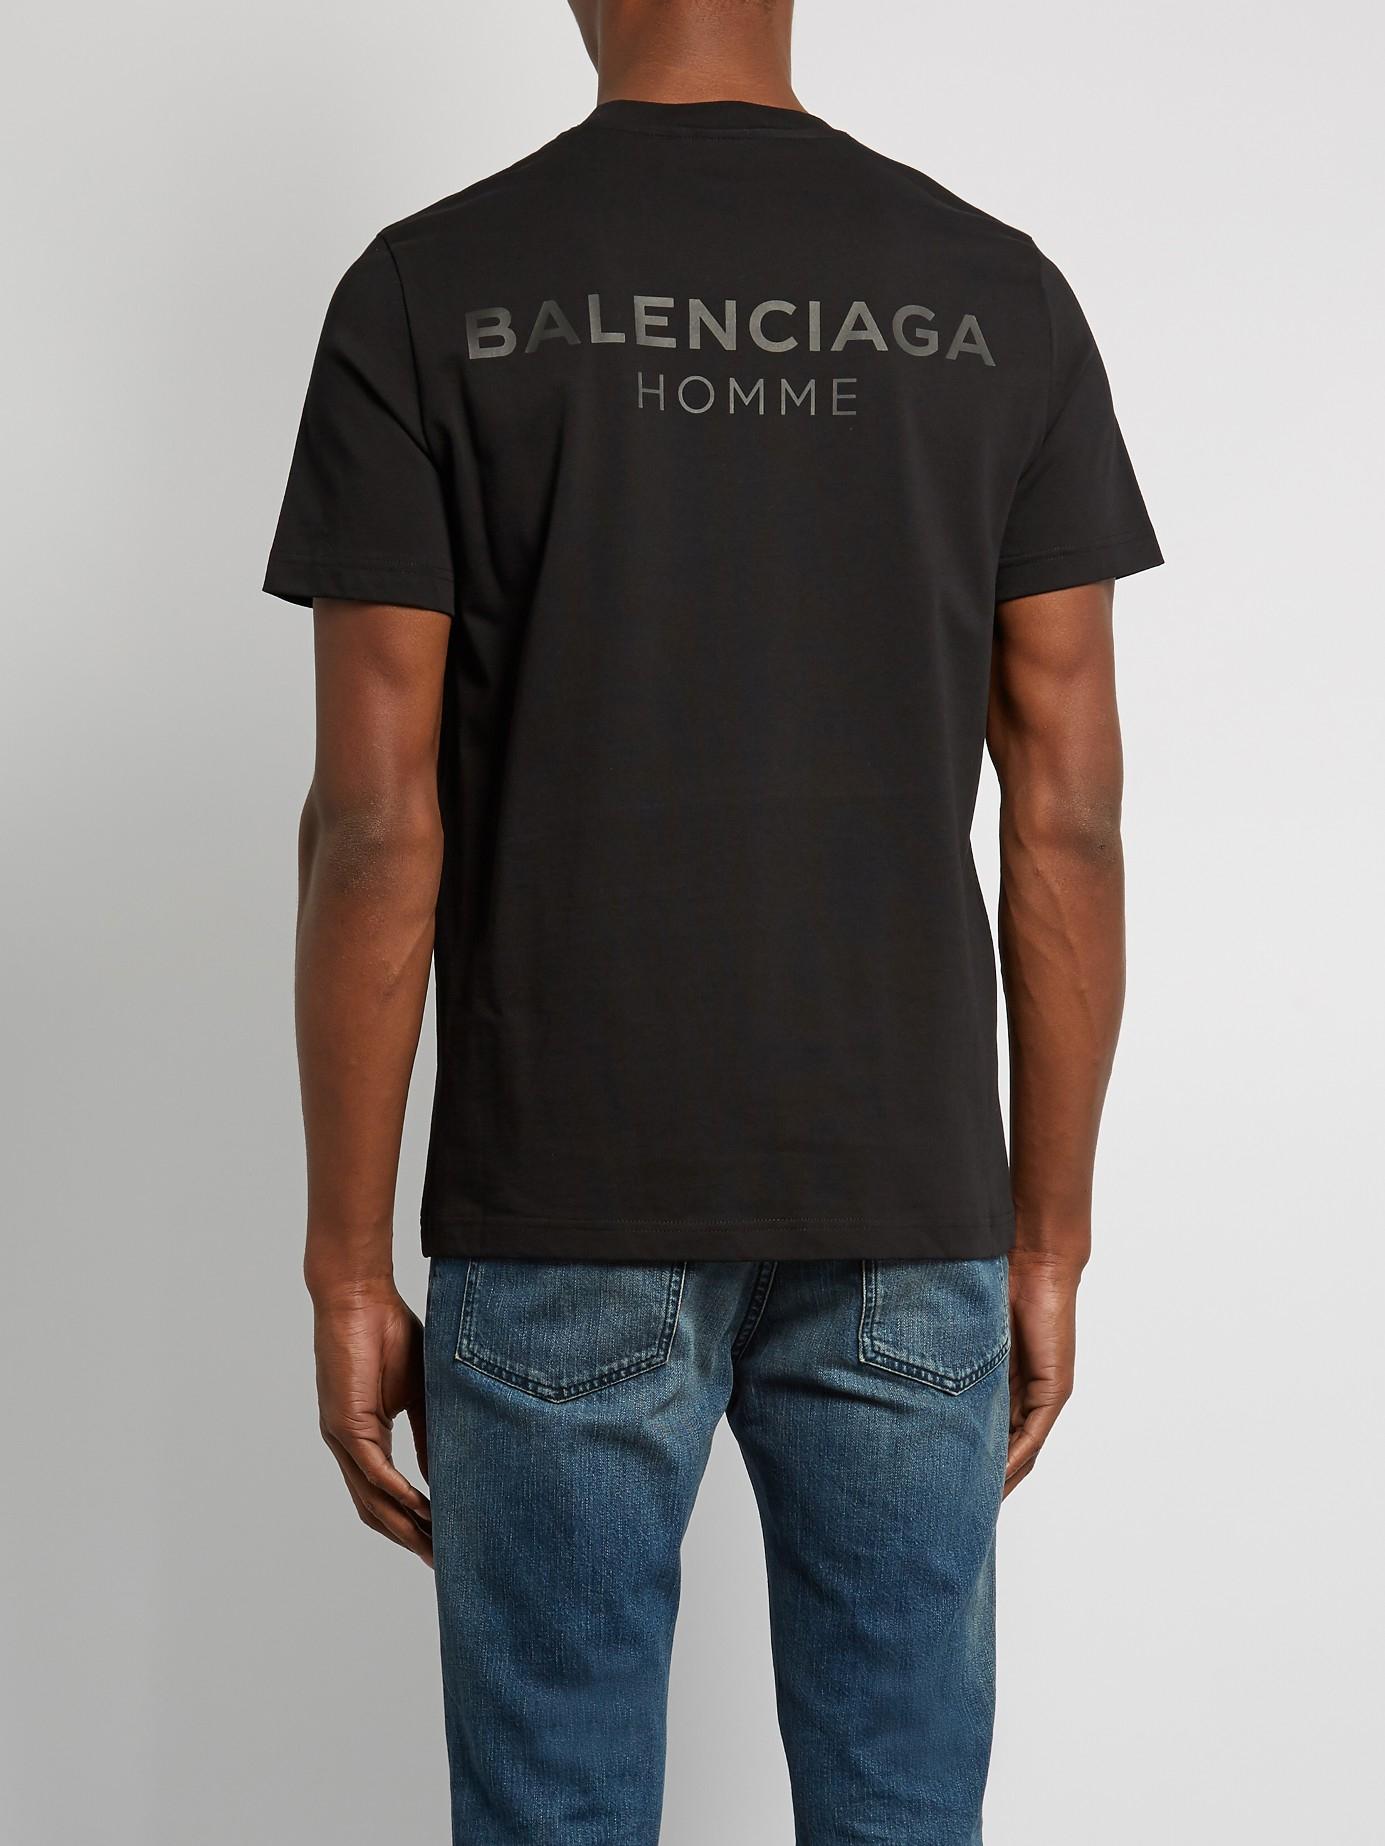 lyst balenciaga logo print cotton t shirt in black for men